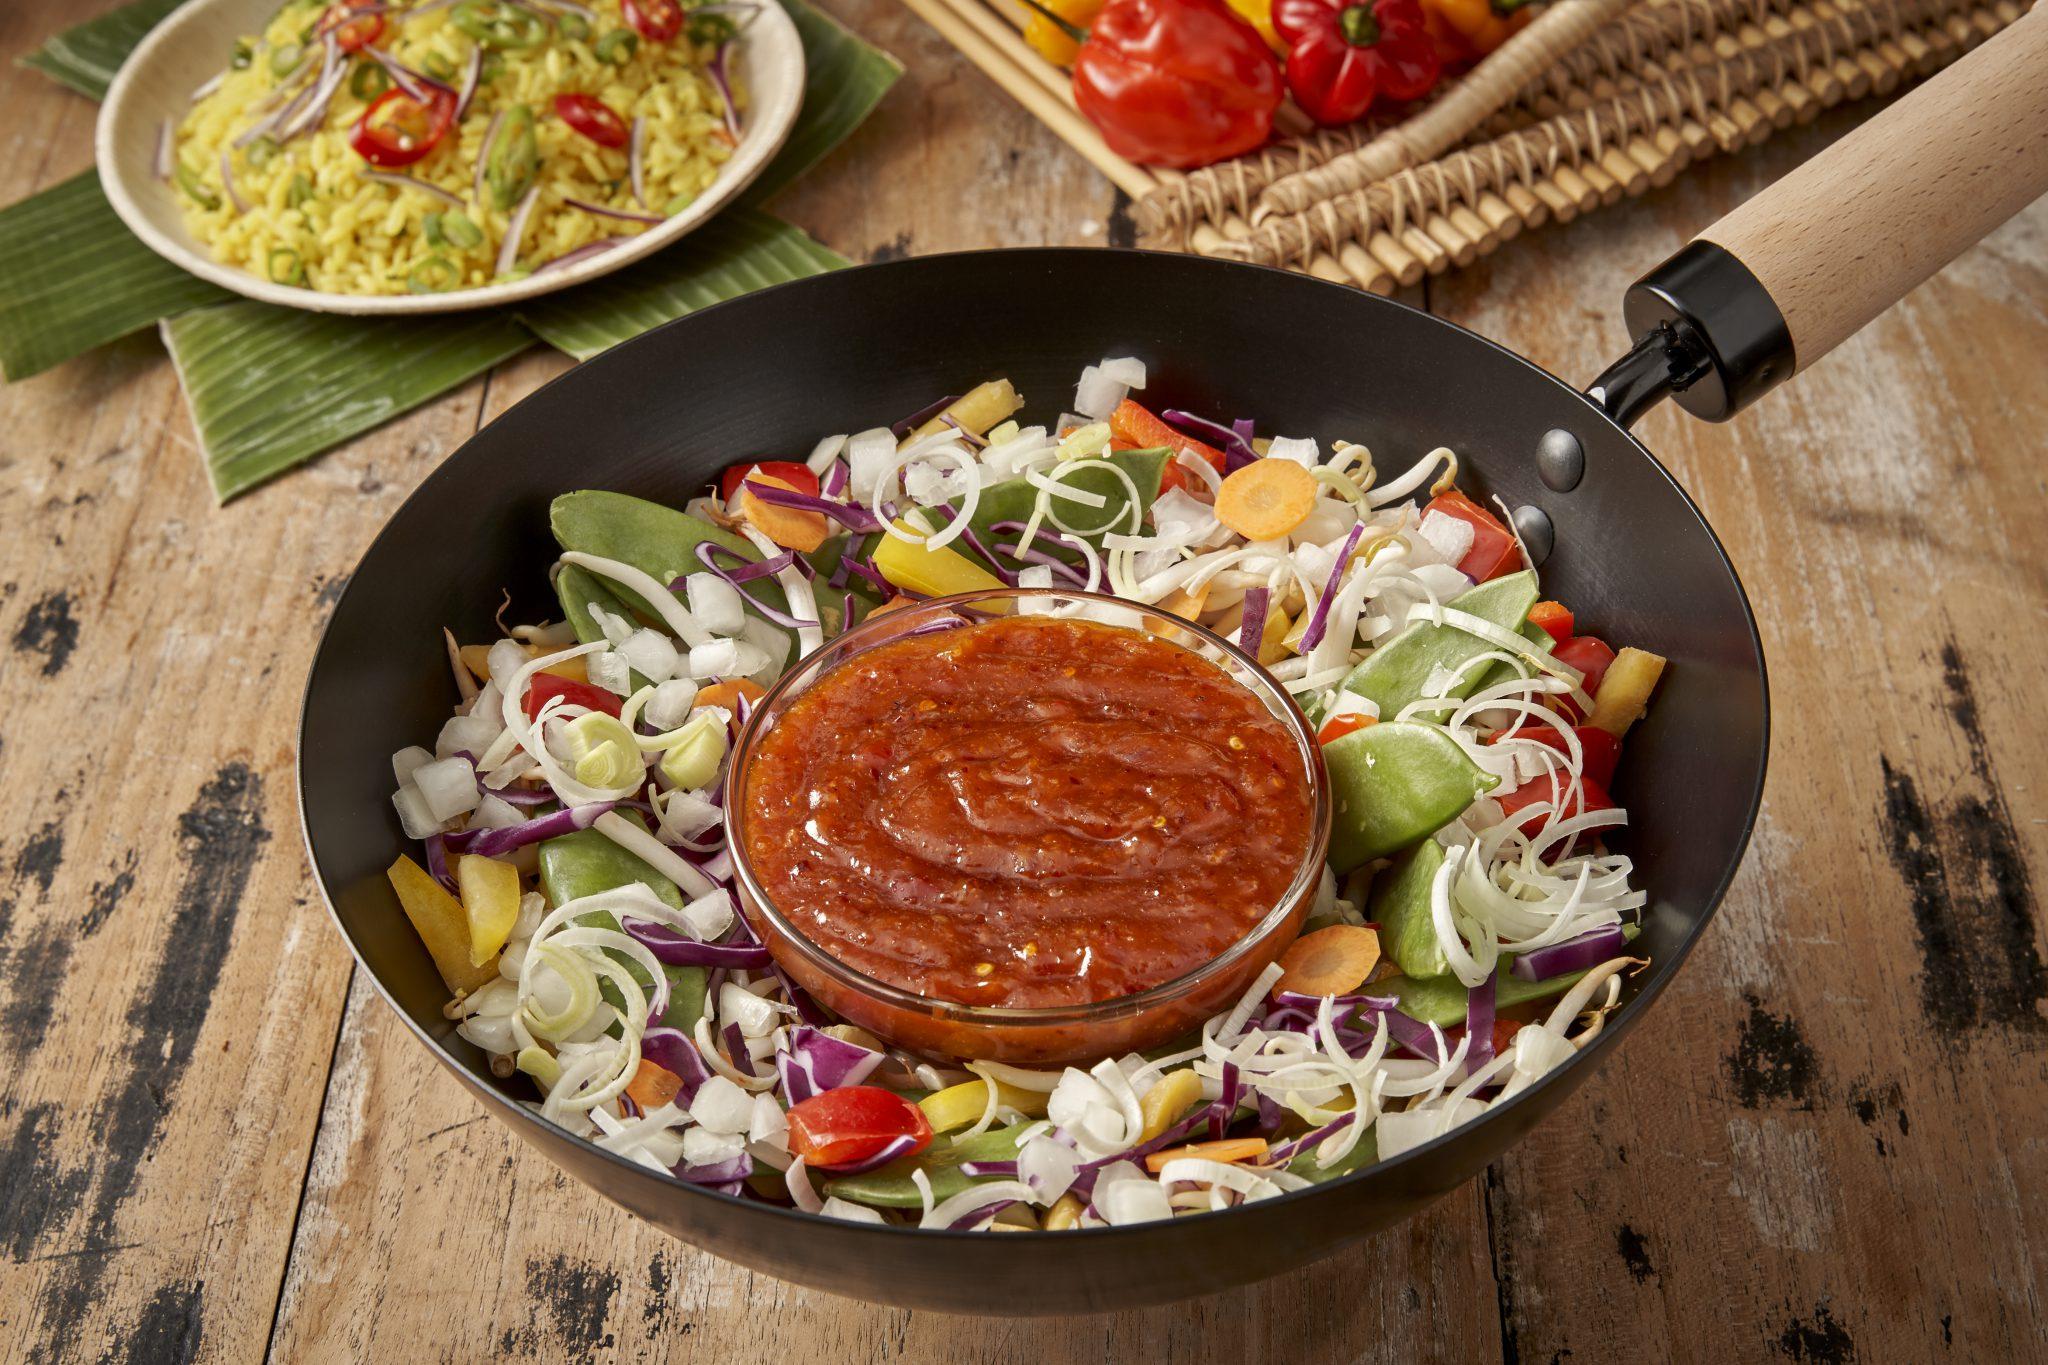 Sweet chili saus